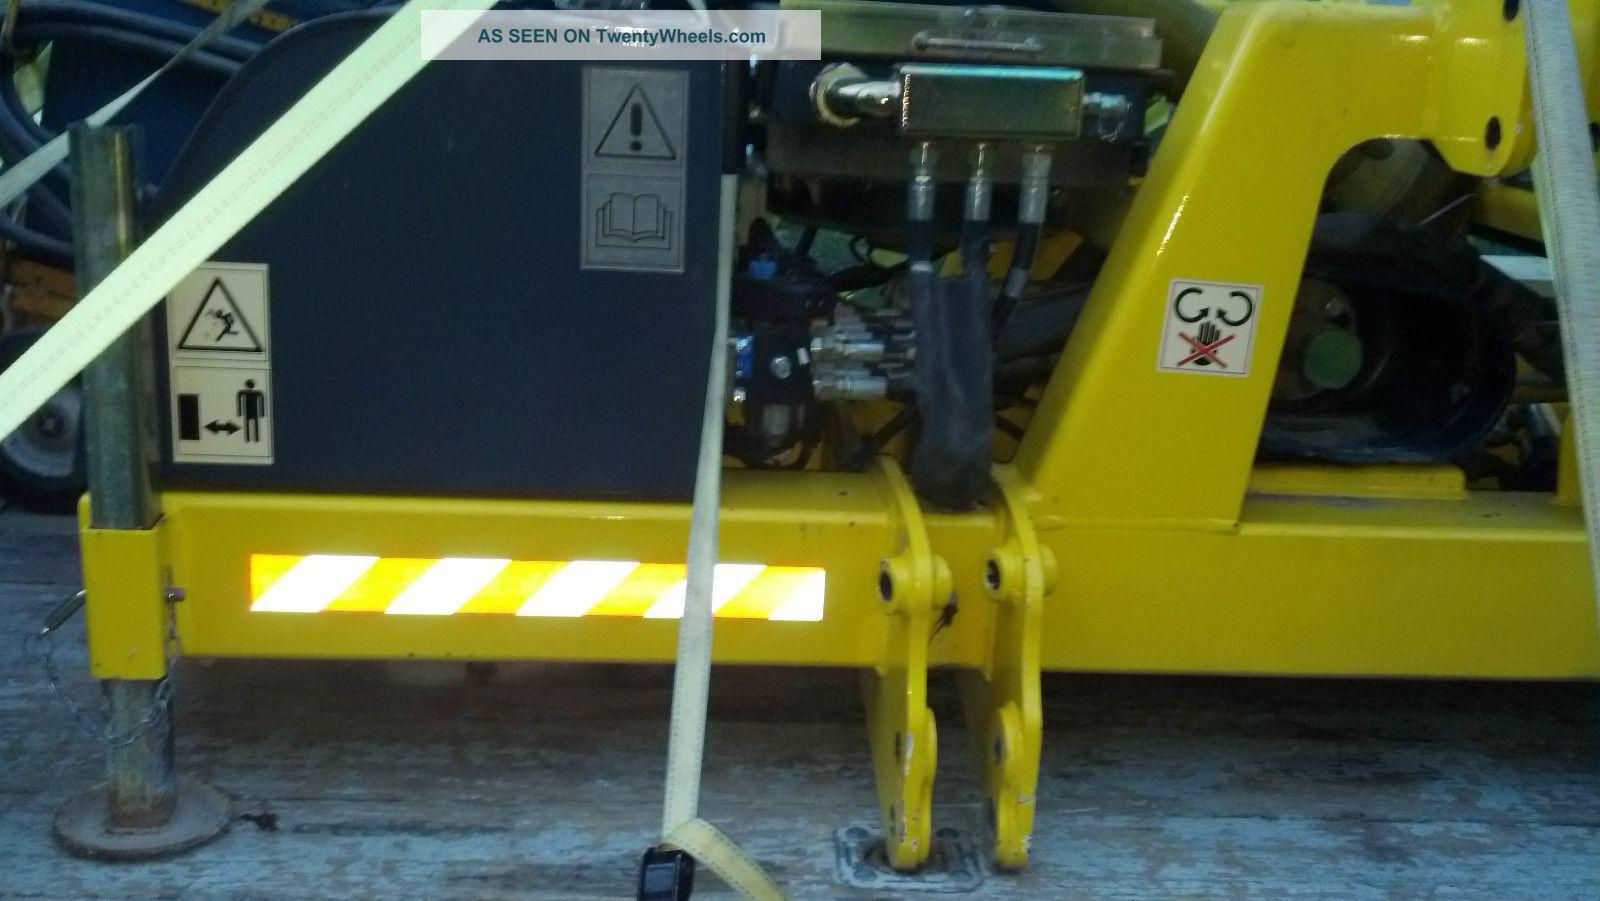 Guardrail Fenceline Mower Boom Reach Brush Hog Flail Cutter Attachment Arm Trim